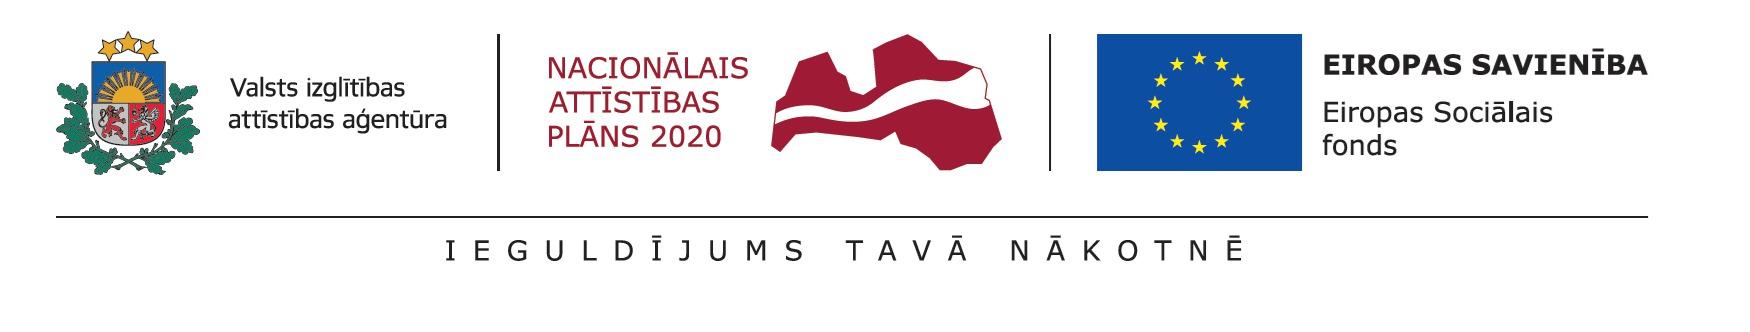 logo0504.jpg